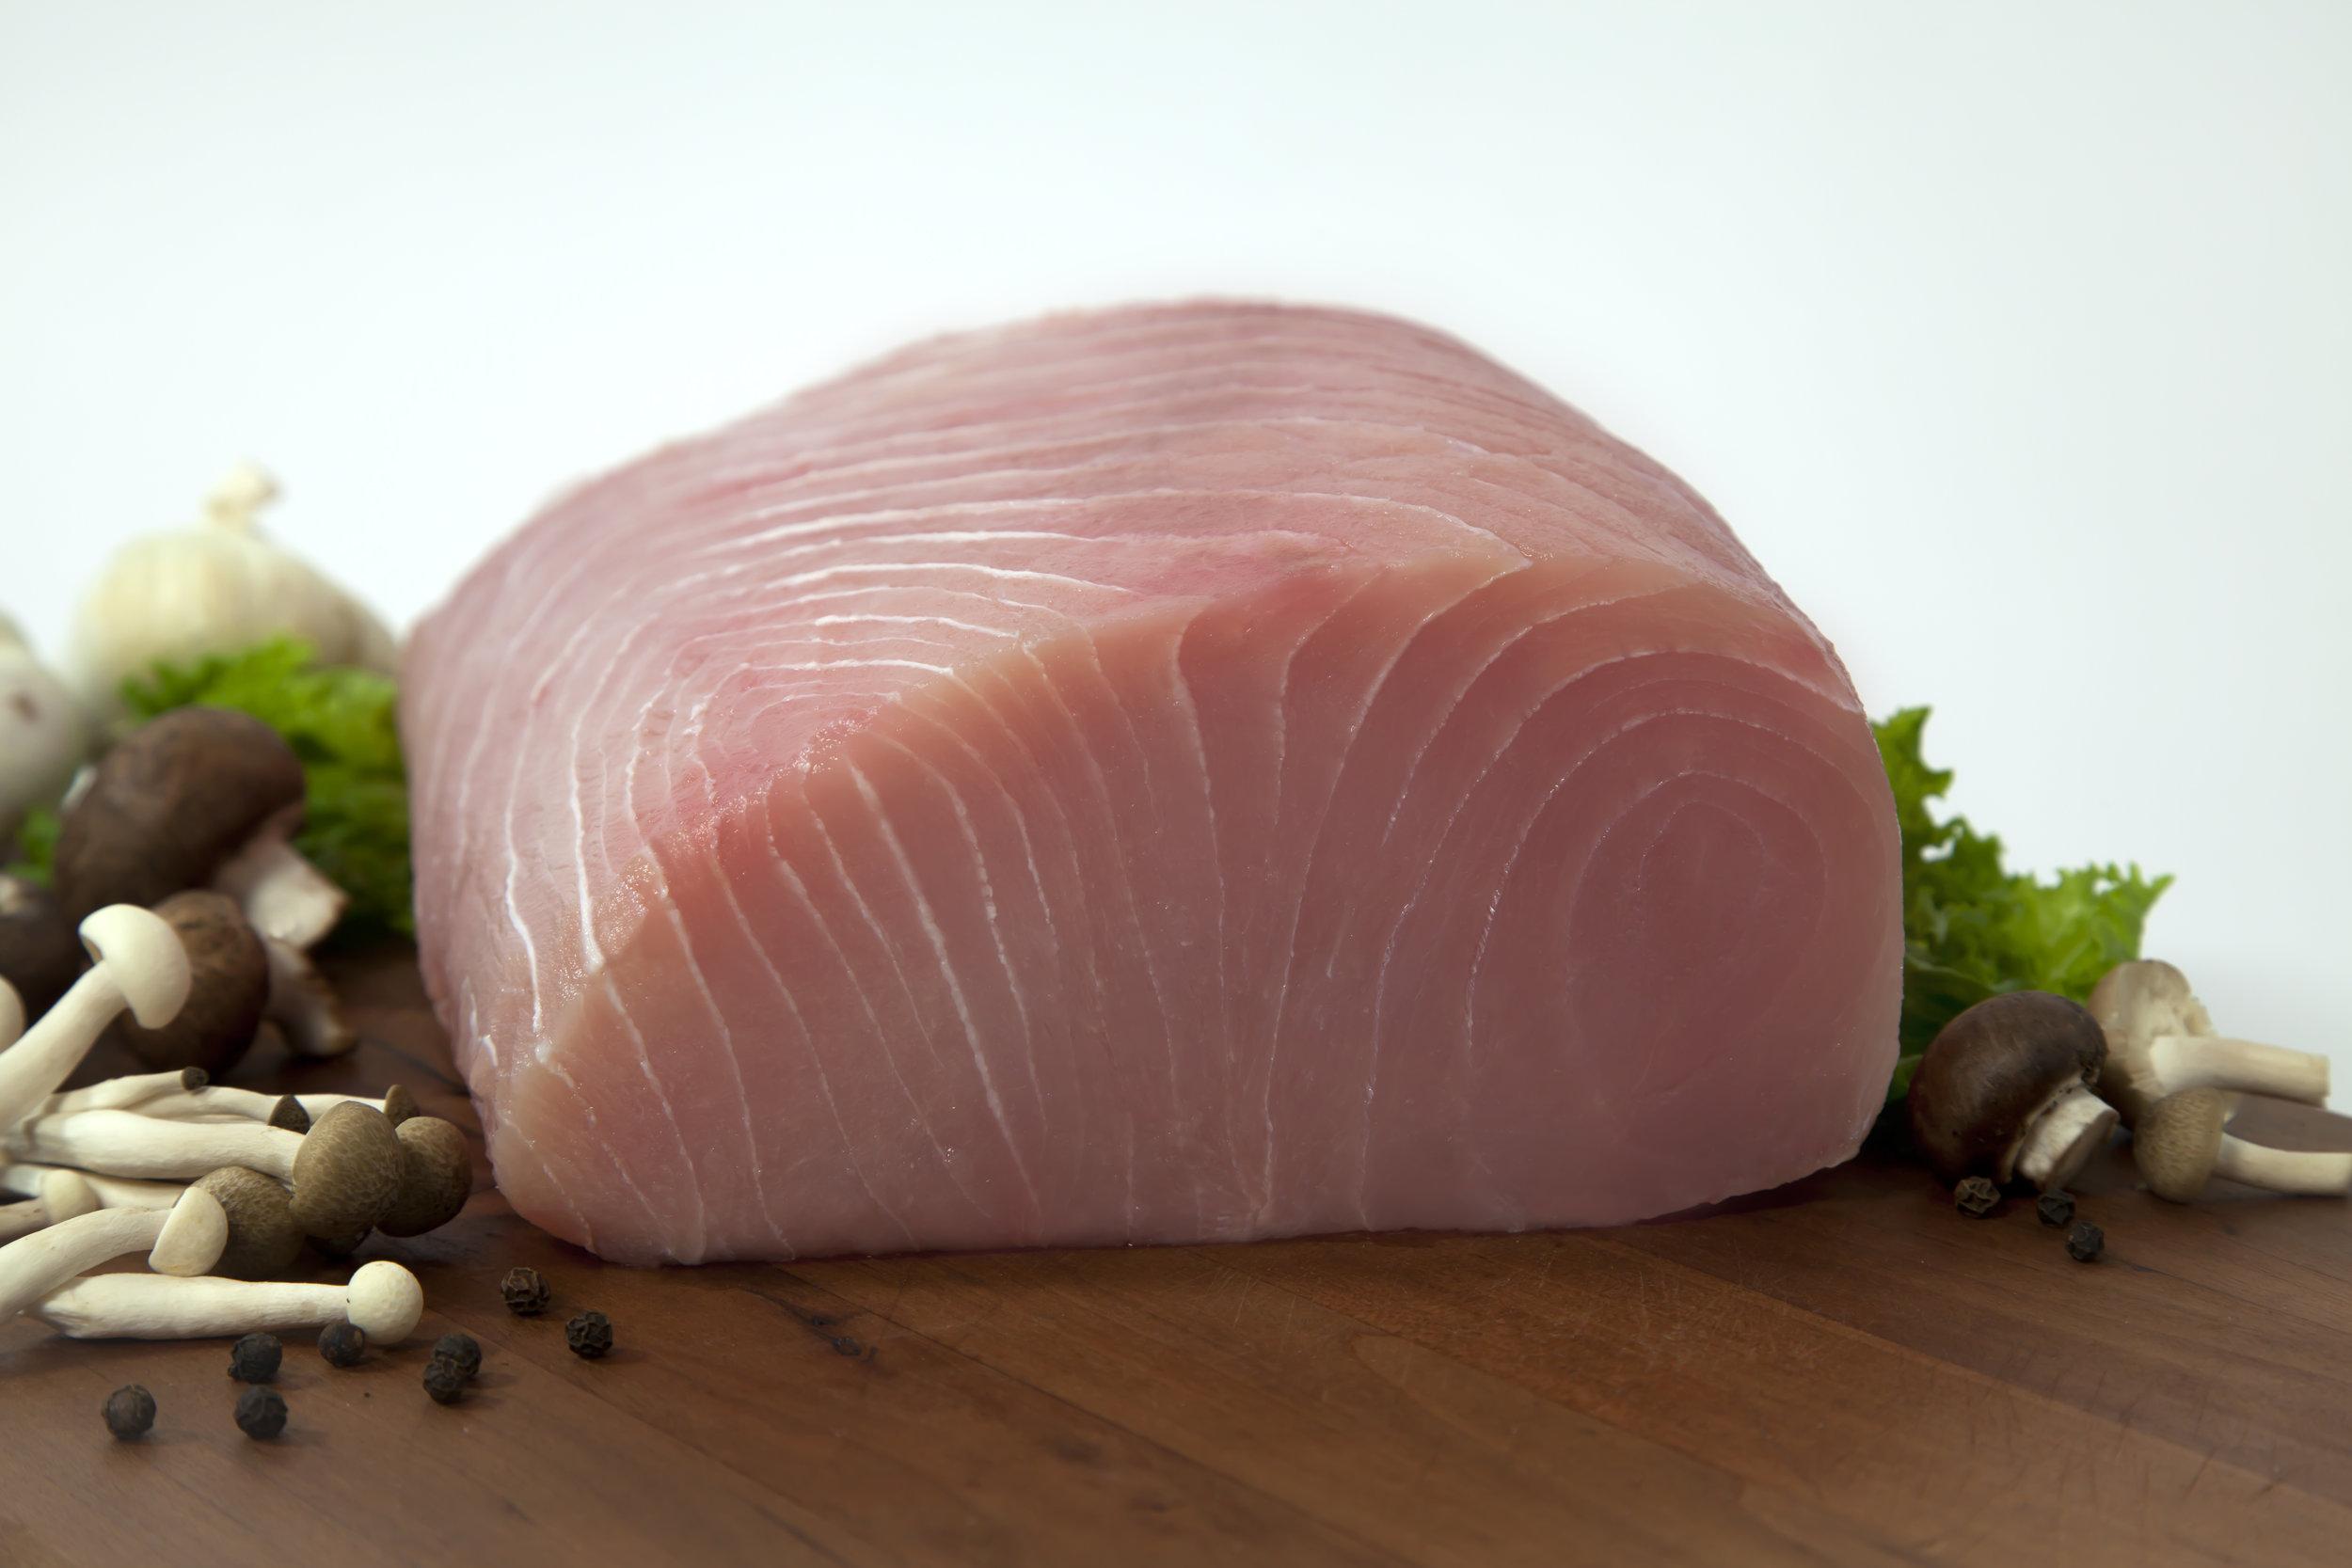 Tasteless Wood Smoke Marlin Loins